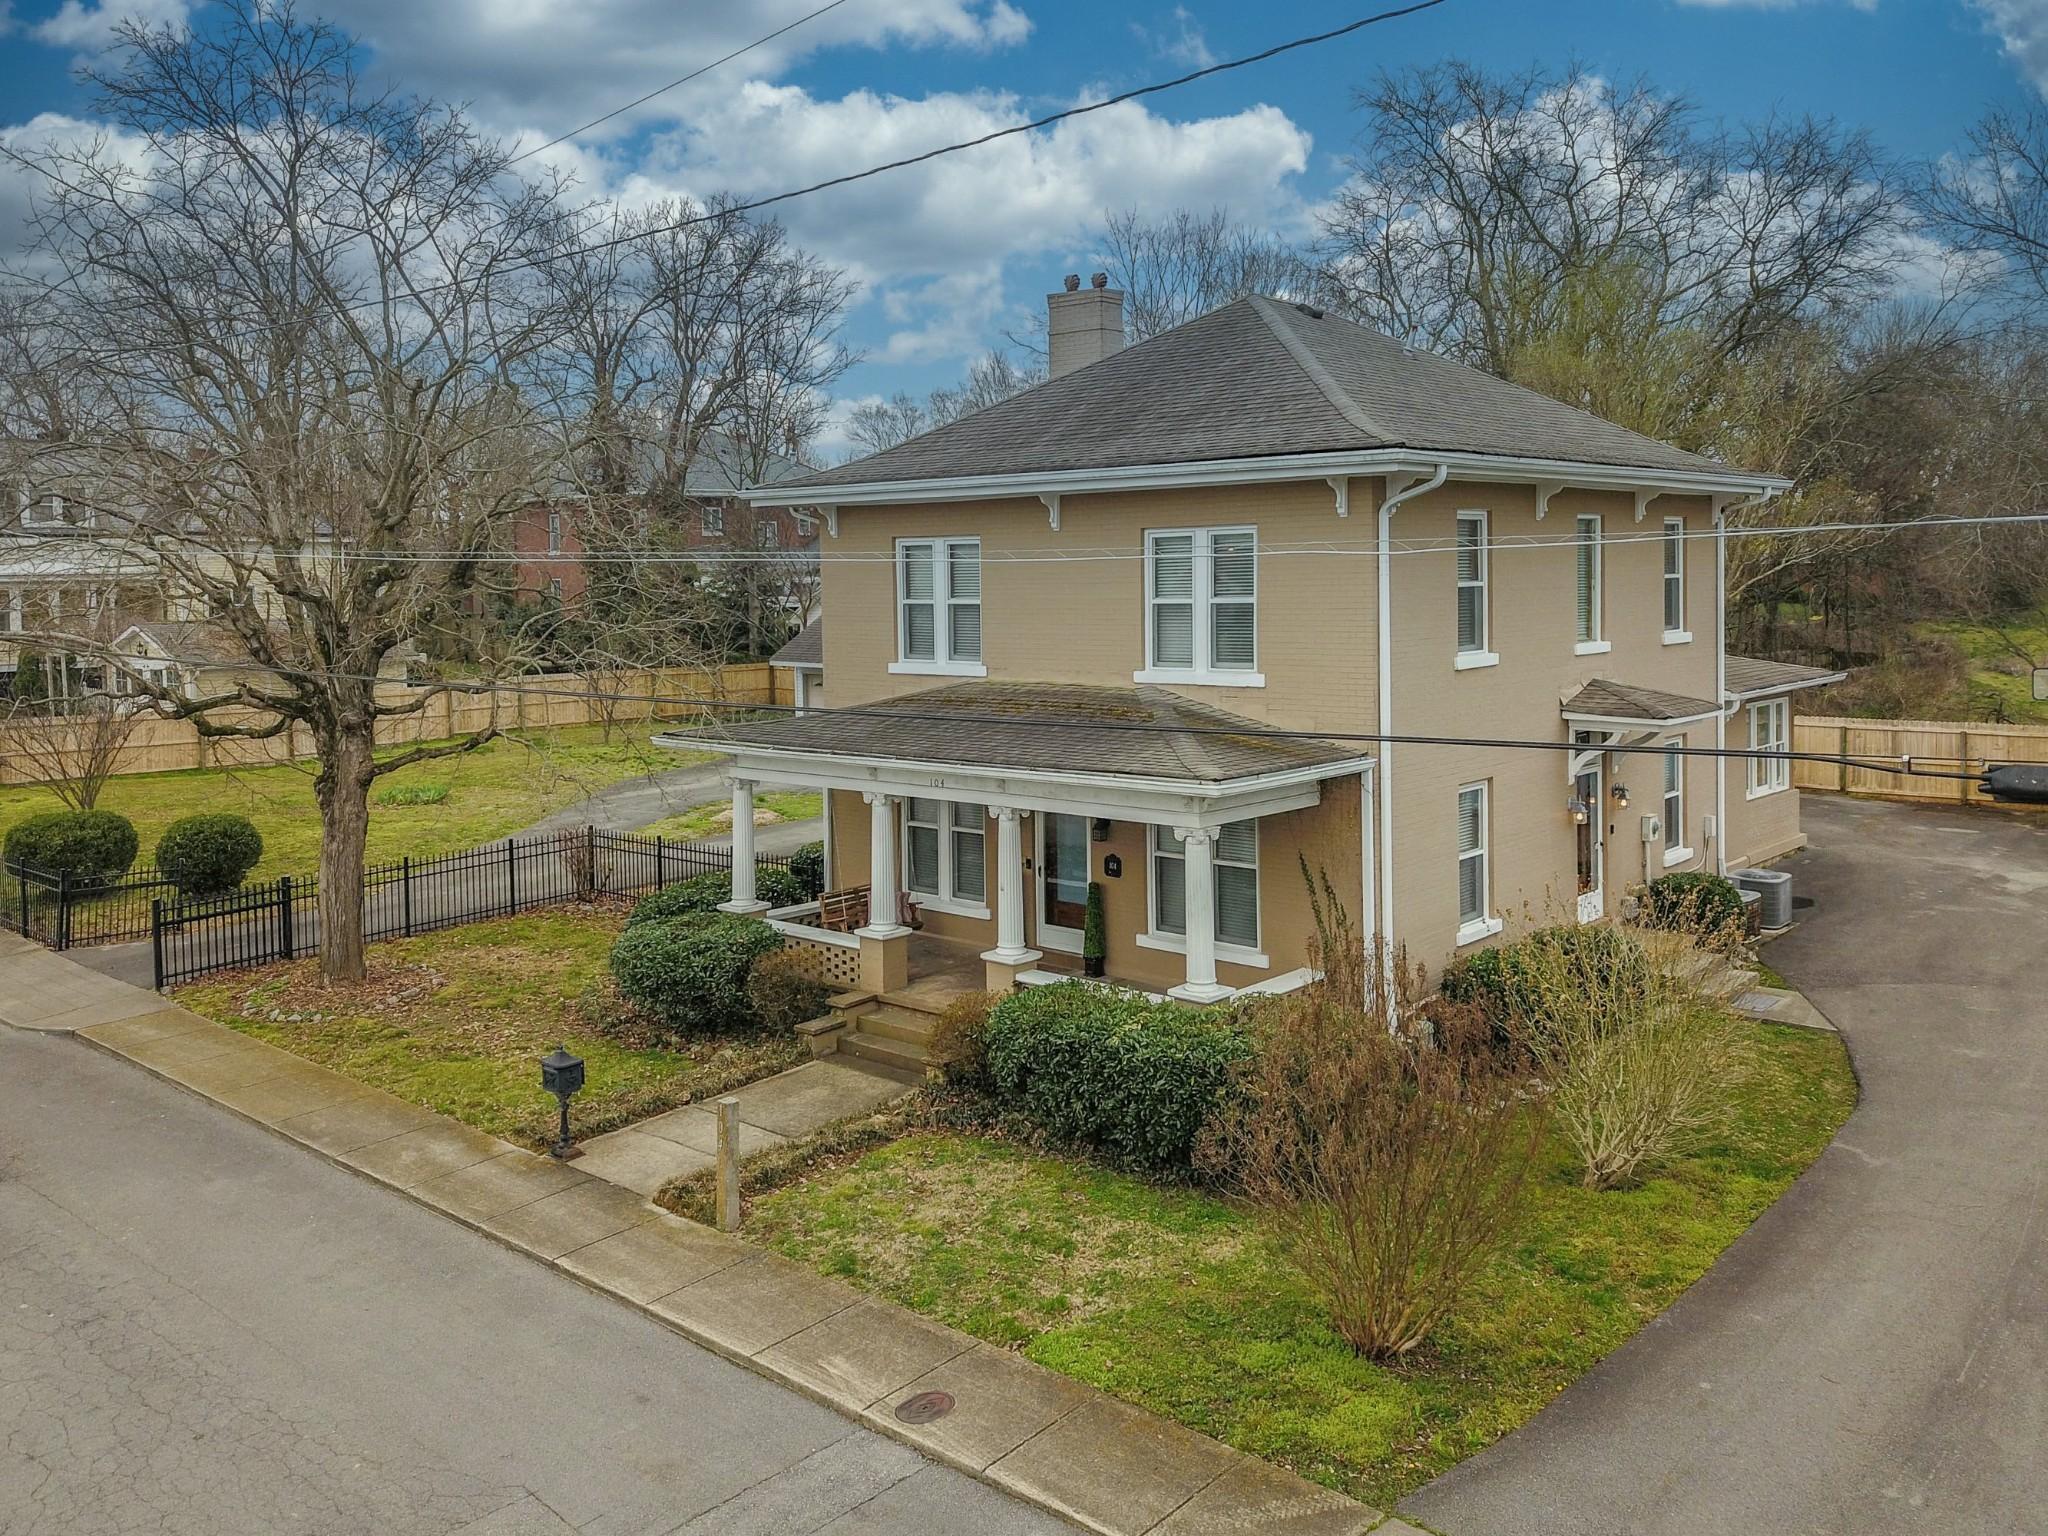 104 3rd Ave , W, Springfield, TN 37172 - Springfield, TN real estate listing